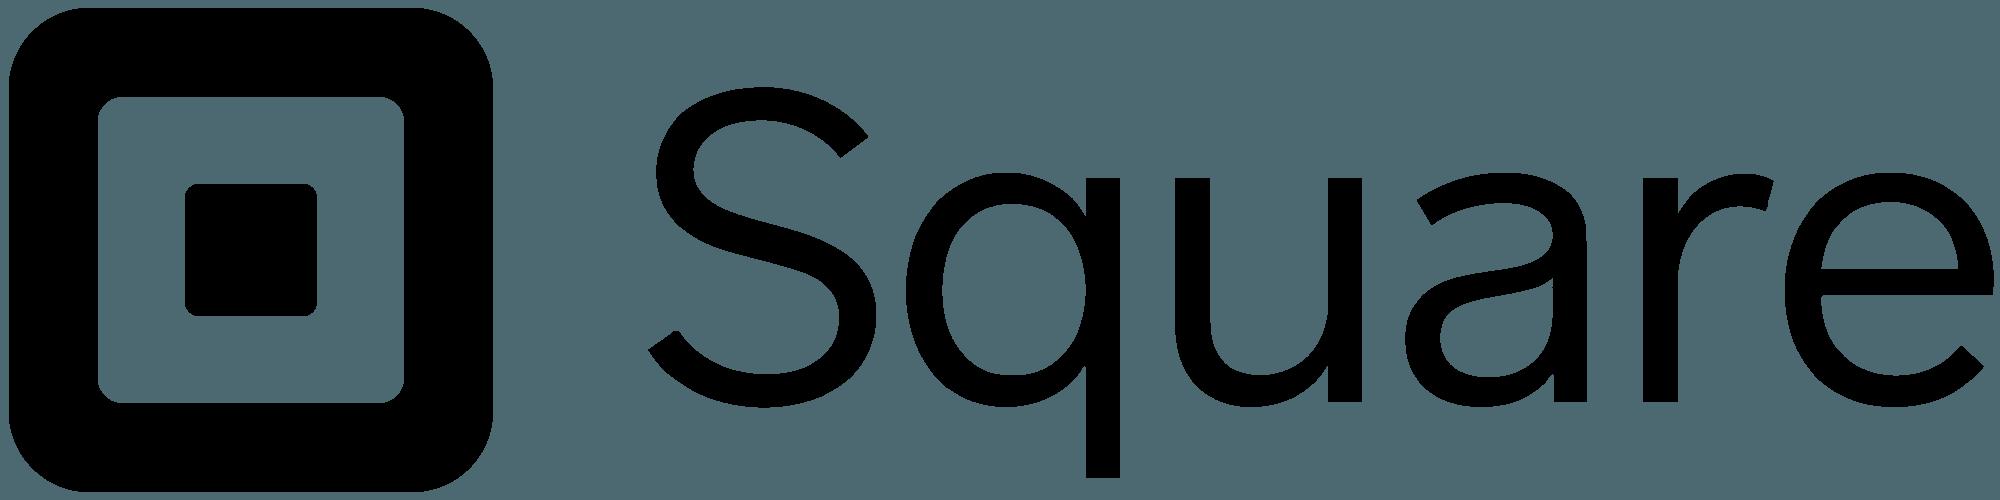 Best POS app - Square